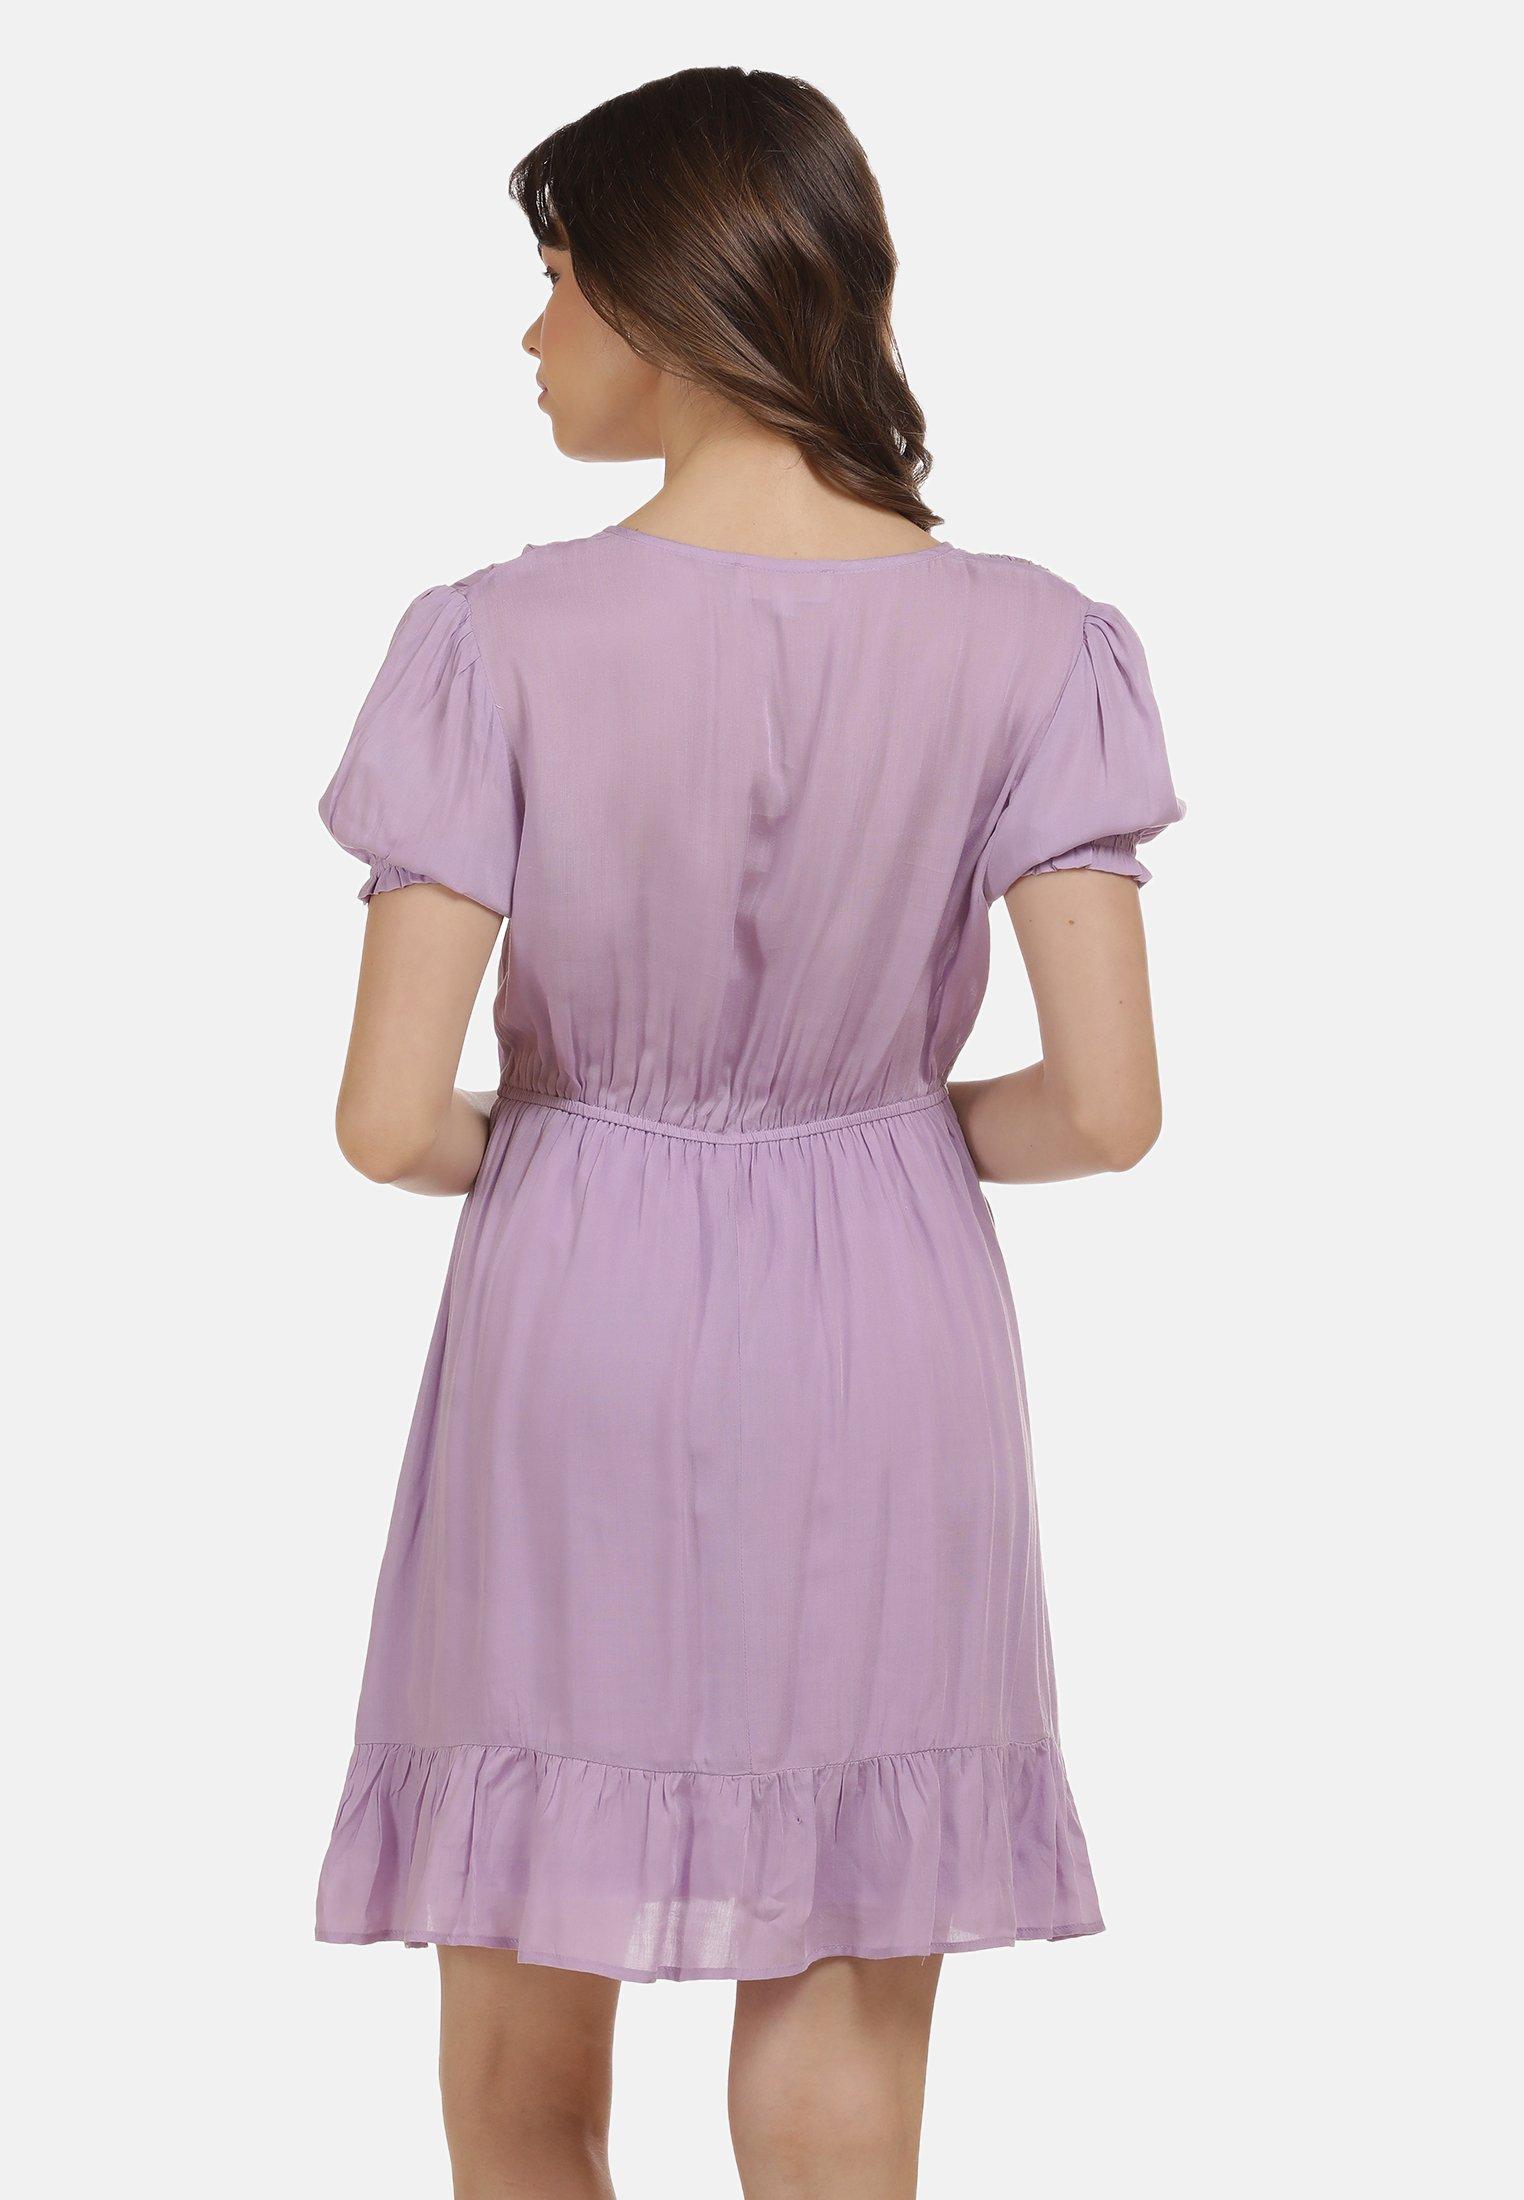 New Styles Women's Clothing myMo MIDIKLEID Day dress flieder c1brL8jmv